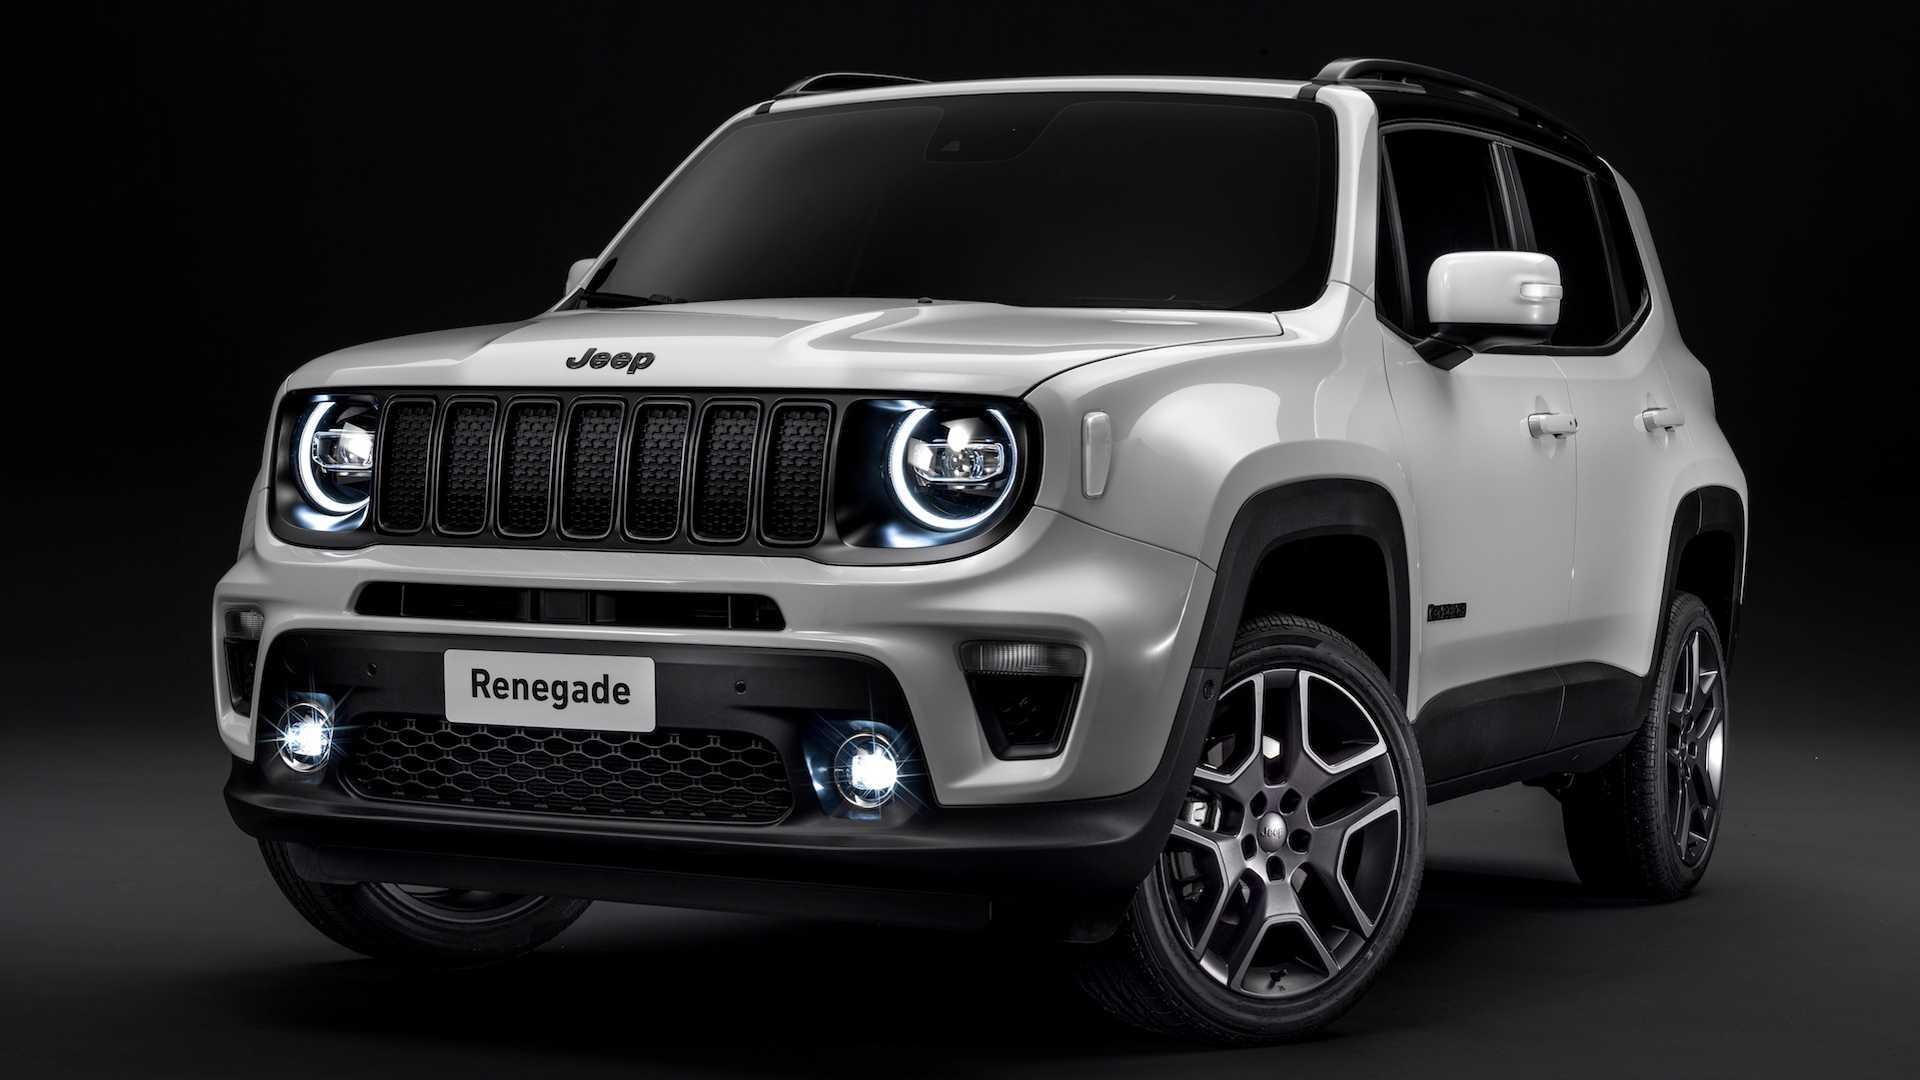 Jeep Renegade S